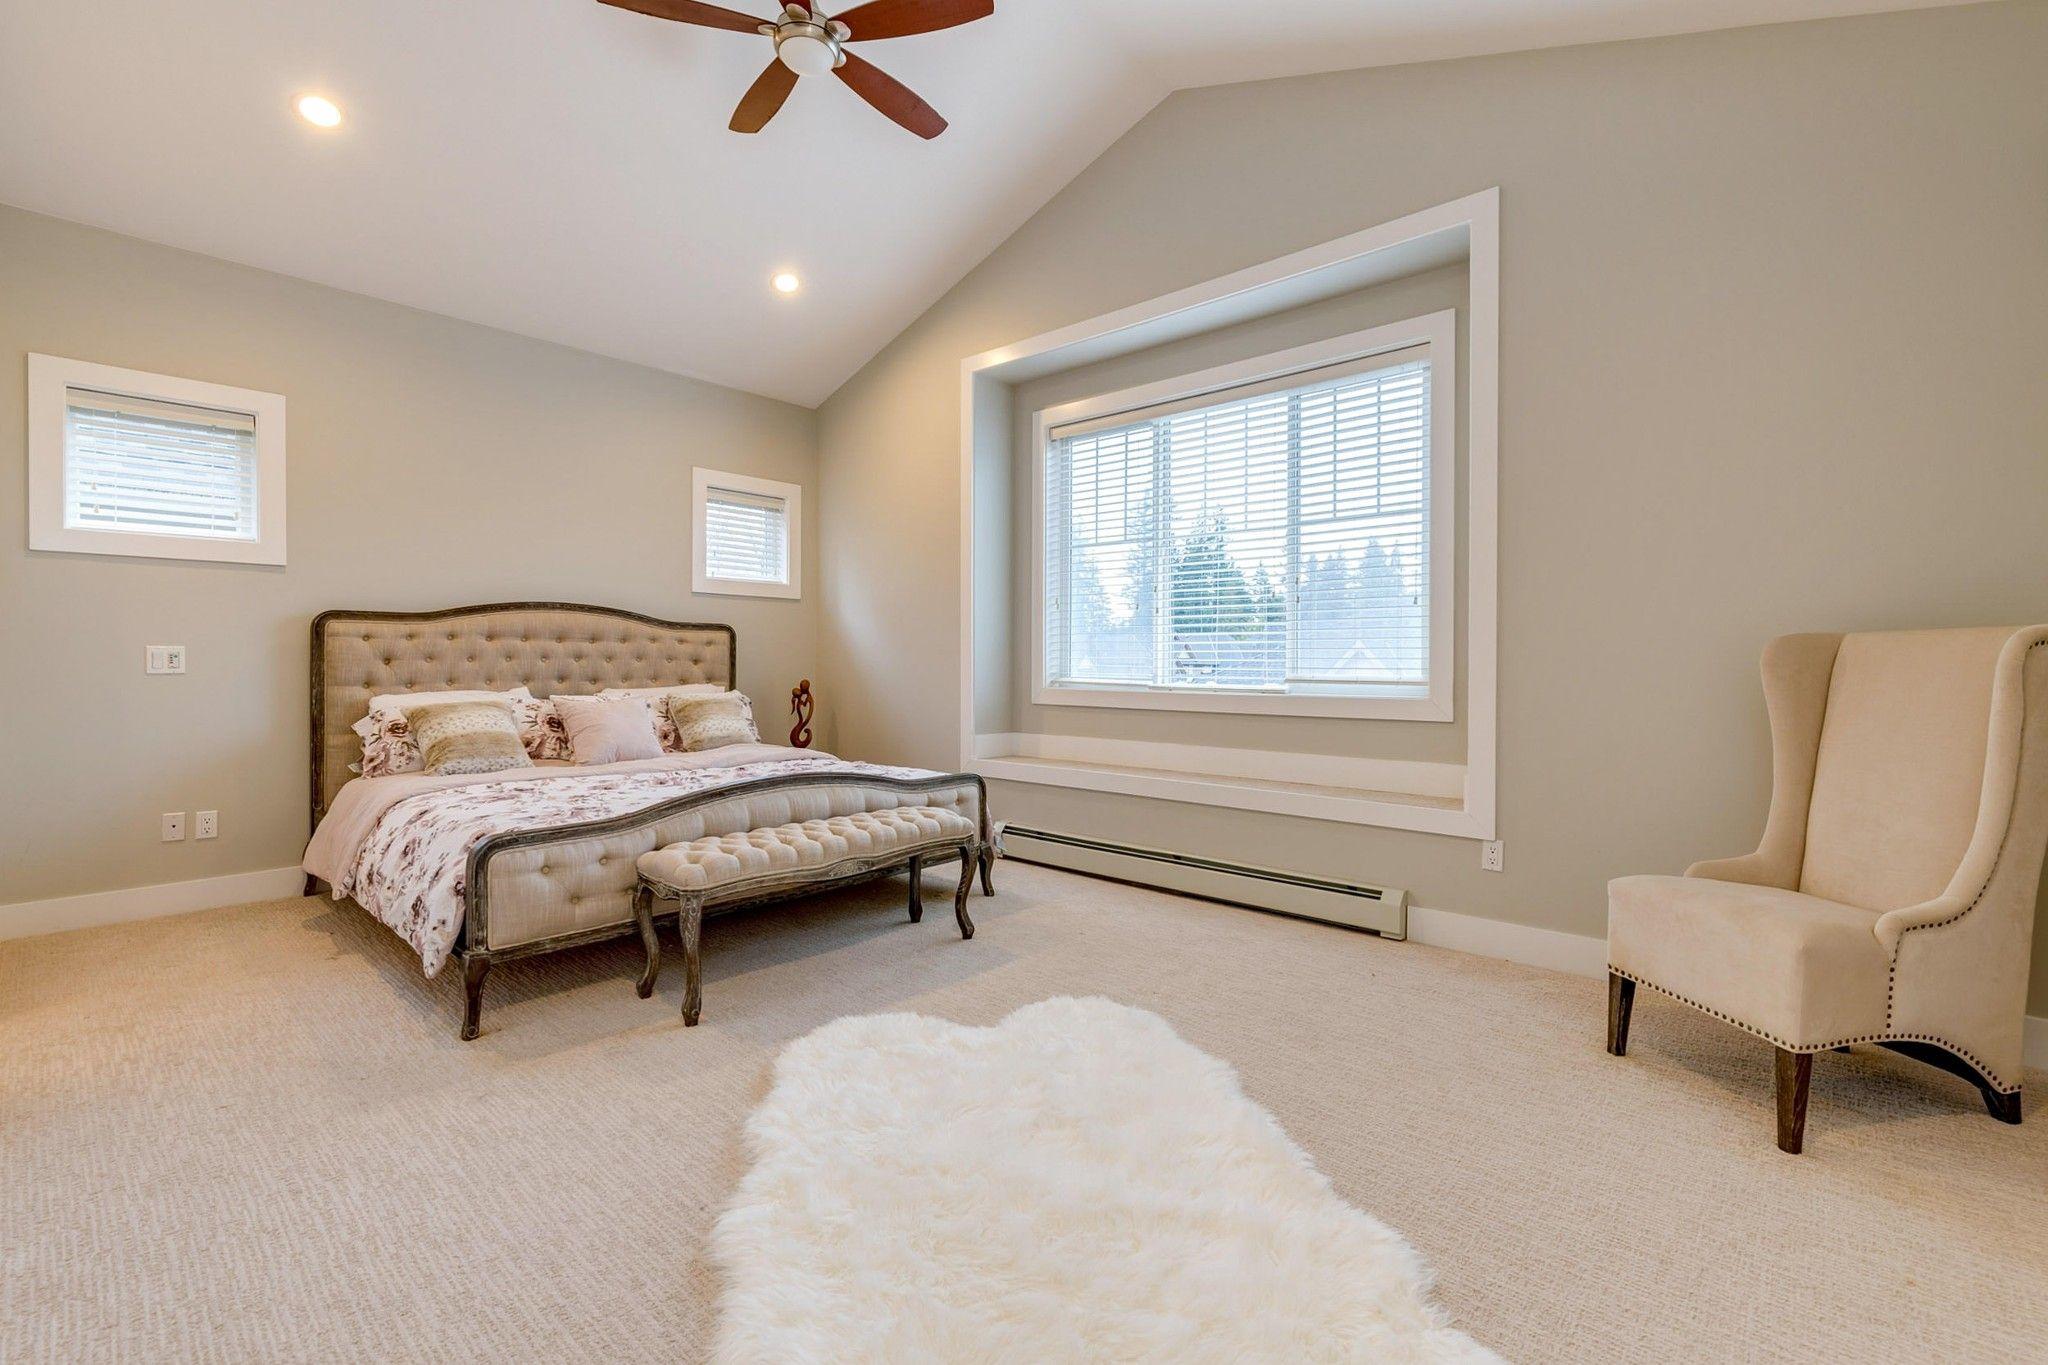 Photo 11: Photos: 1303 Hollybrook Street in Coquitlam: Burke Mountain House for sale : MLS®# R2423196